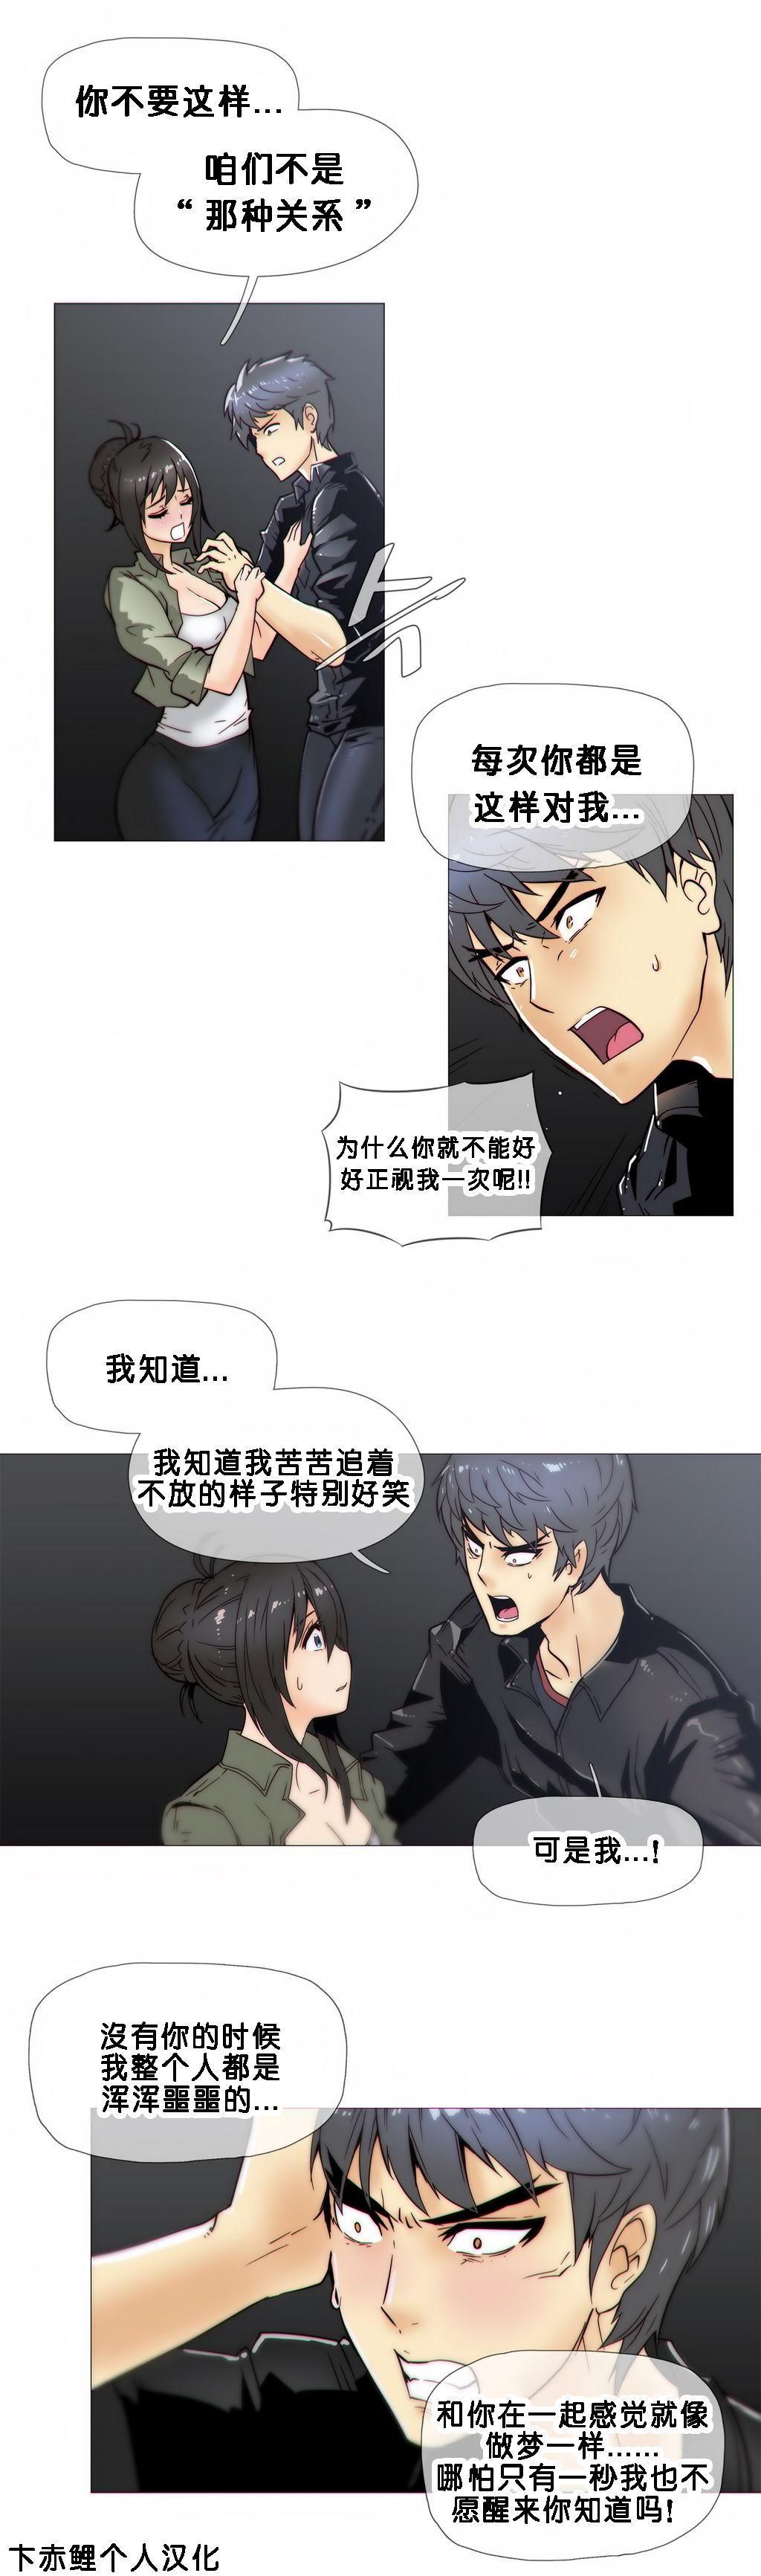 HouseHold Affairs 【卞赤鲤个人汉化】1~33话(持续更新中) 475